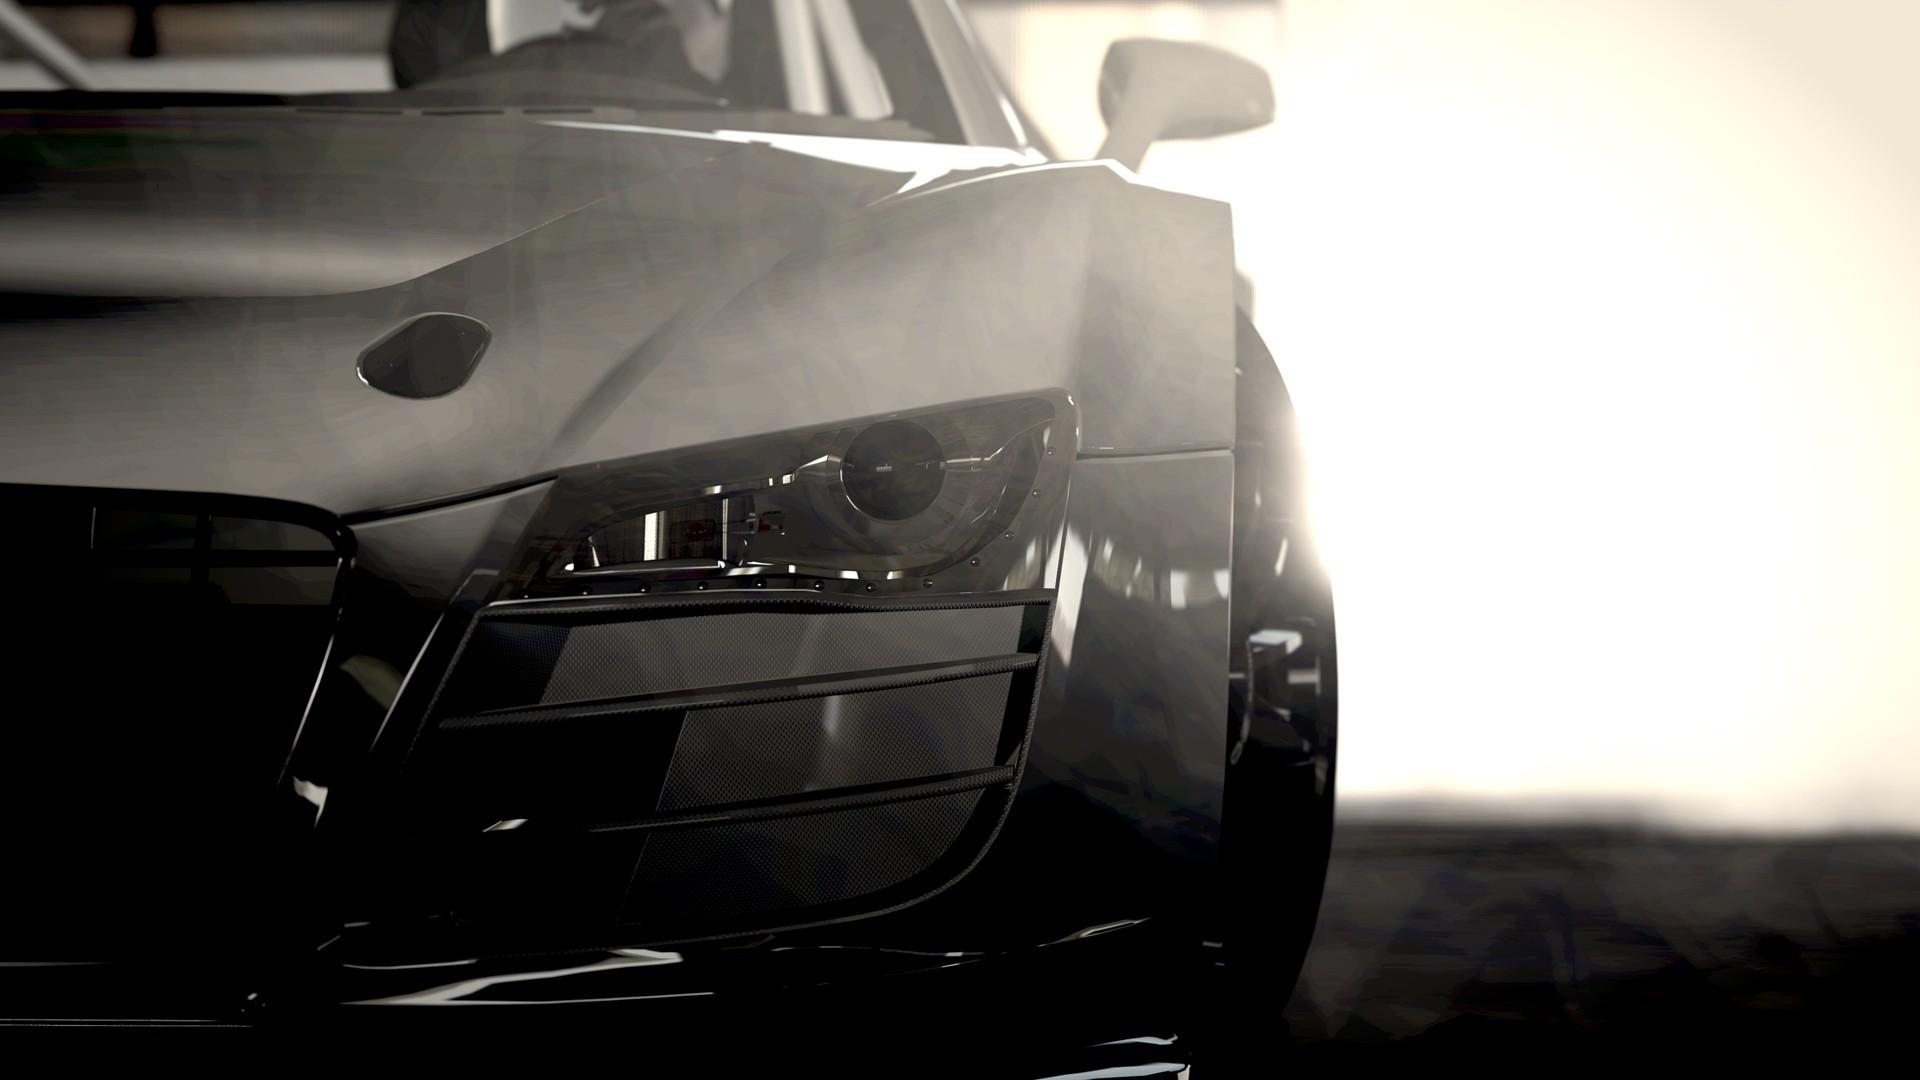 Audi R8 Headlight Section